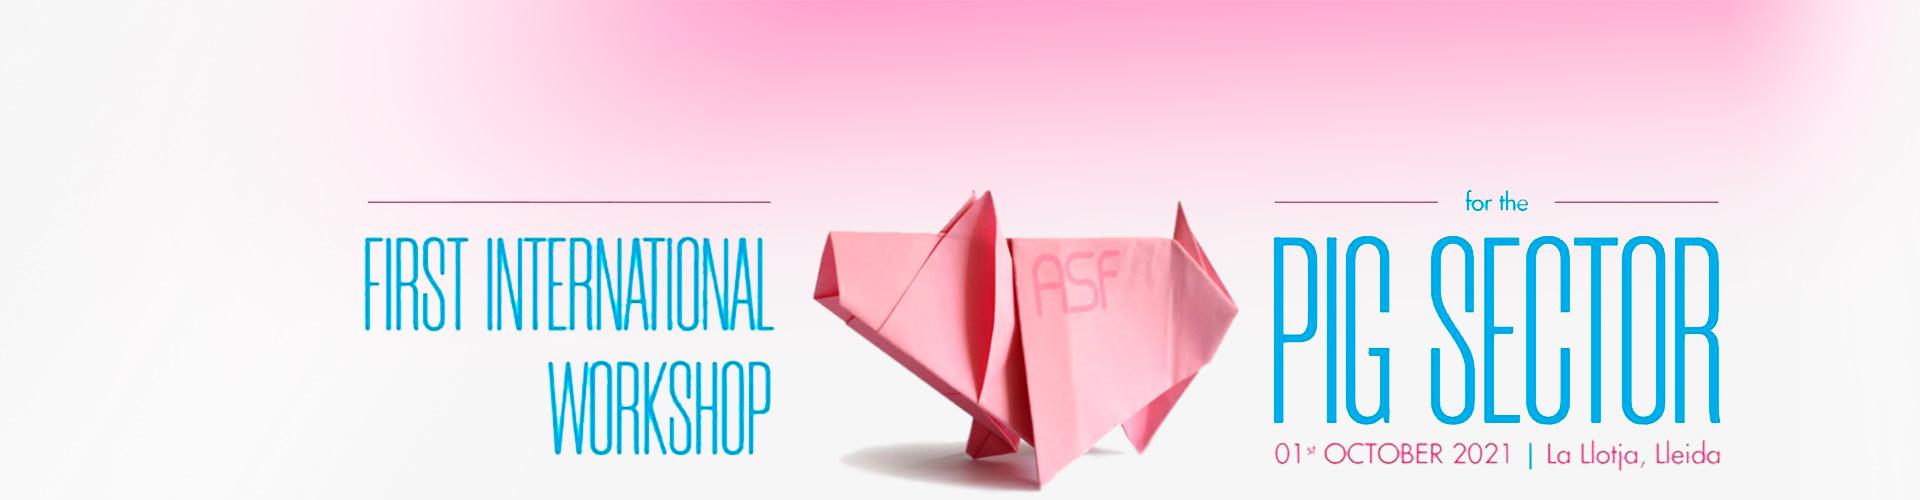 VACDIVA: 1st International Workshop for the Pig Industry